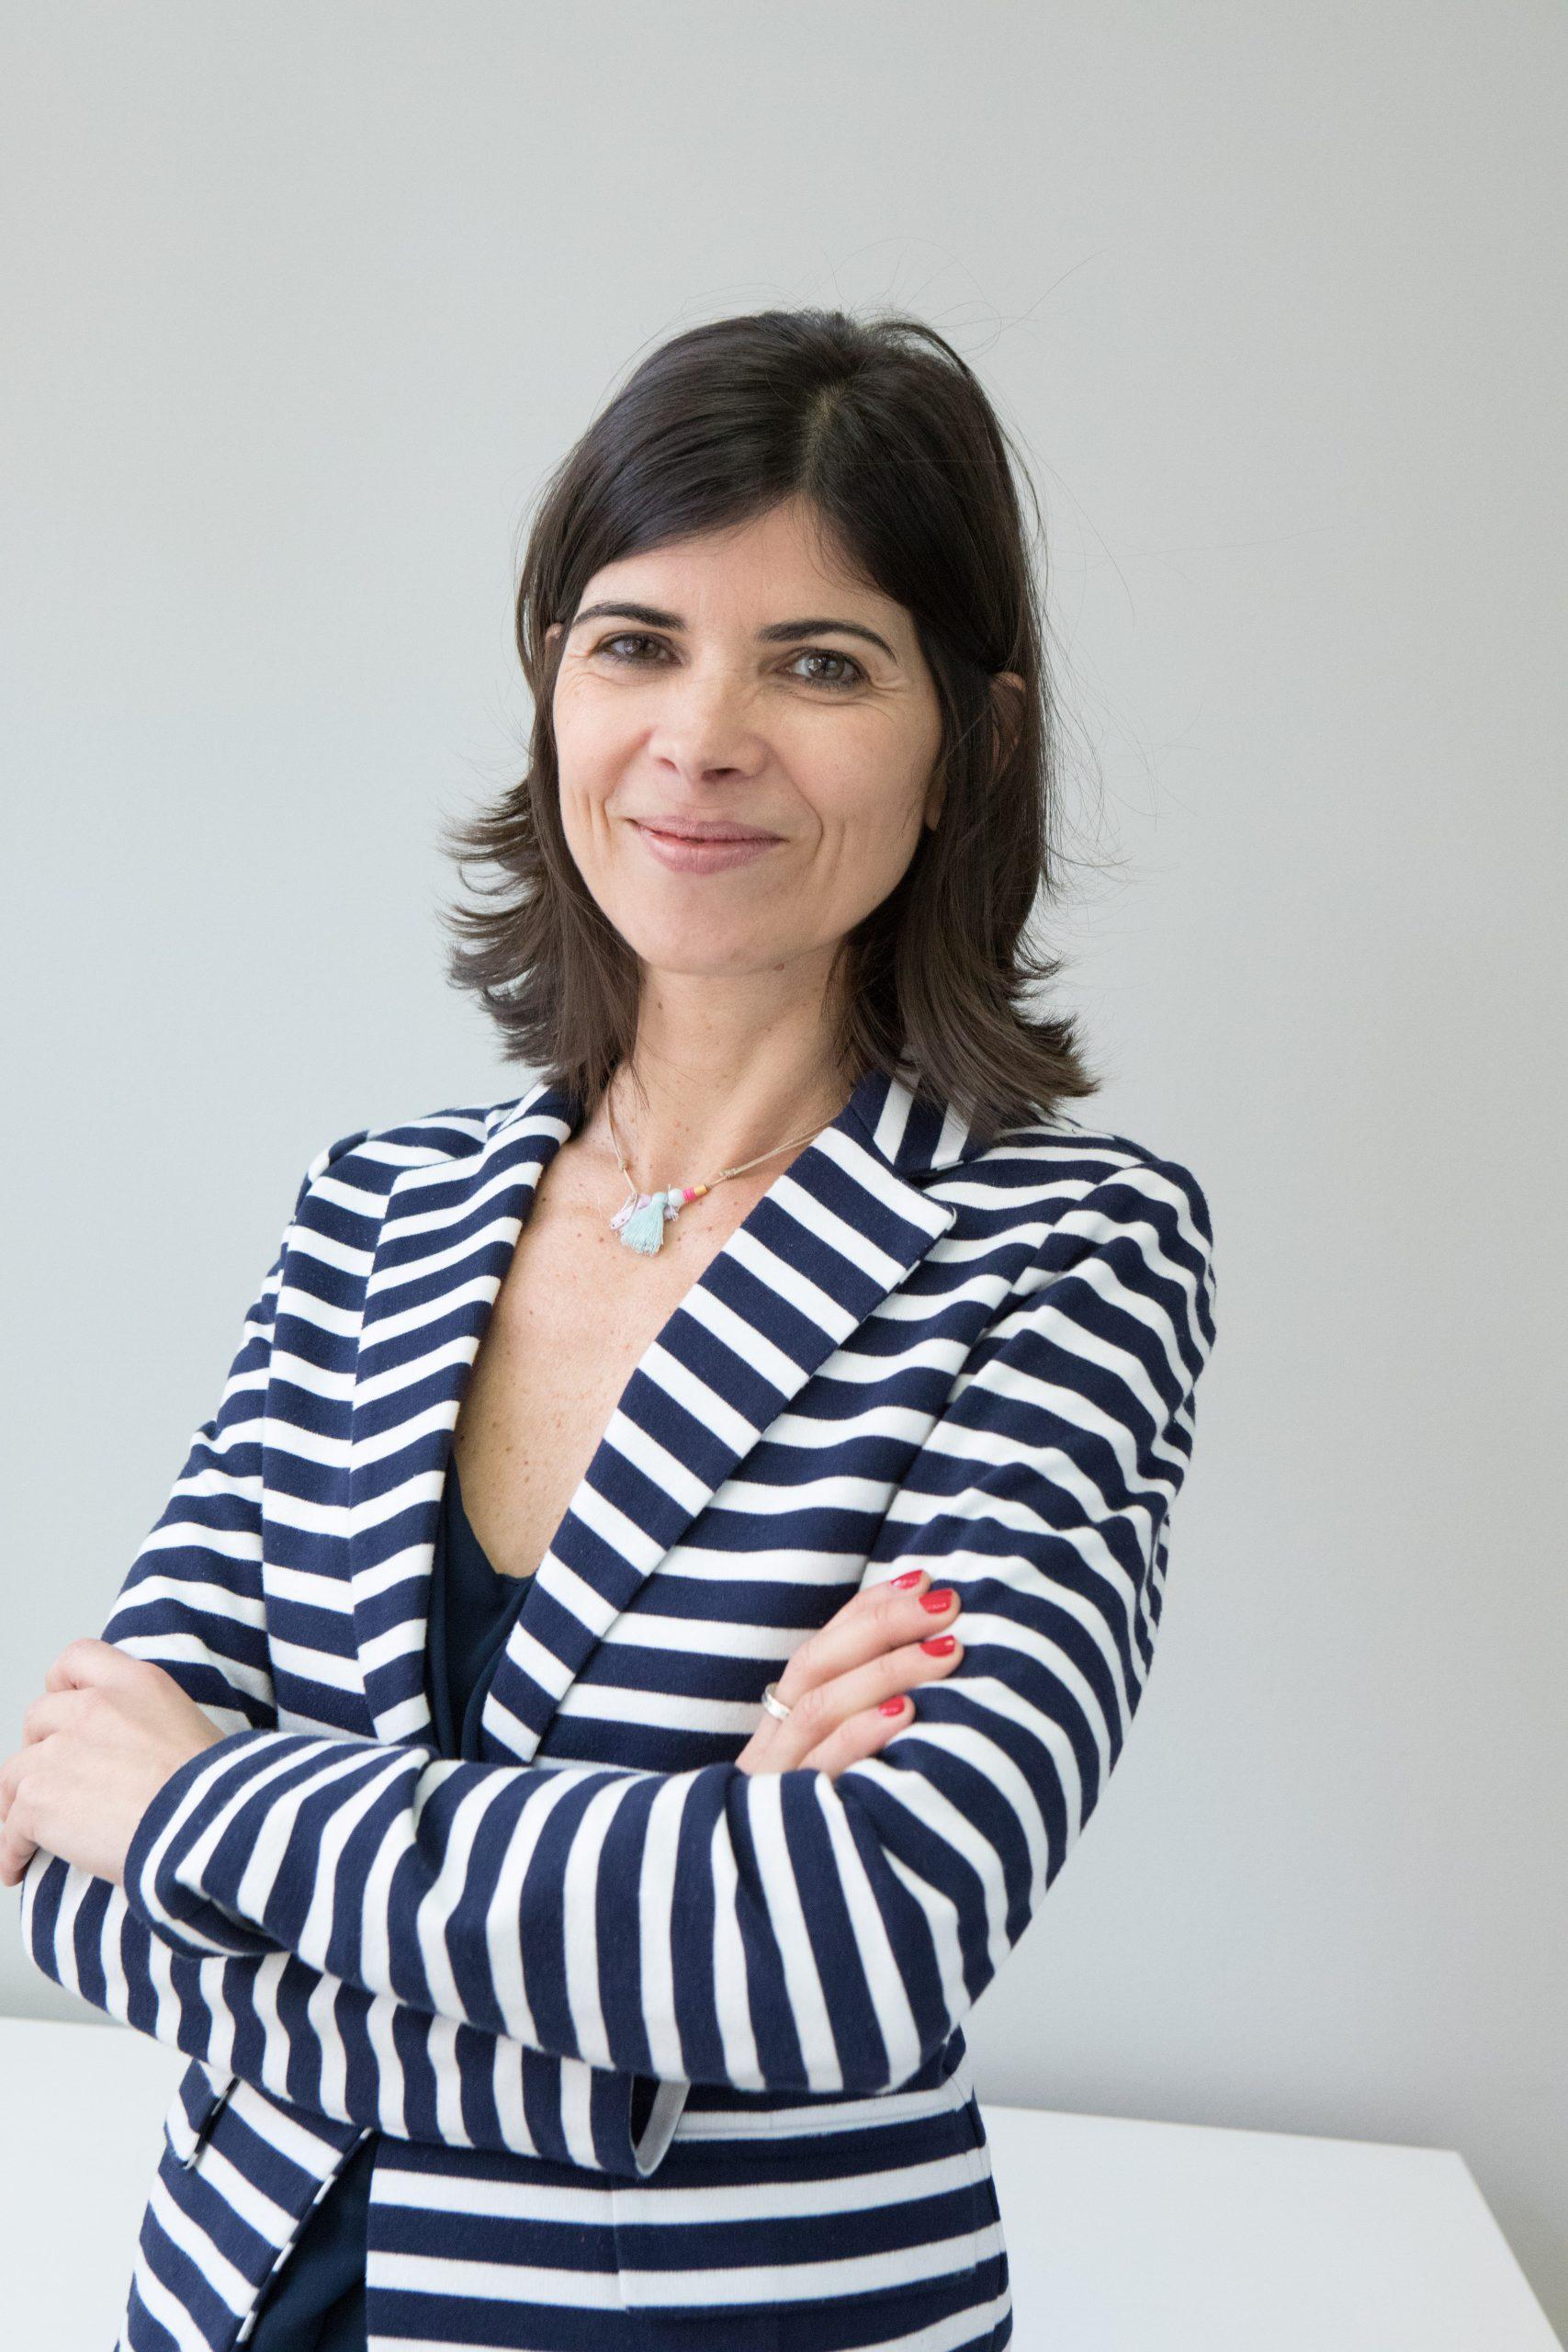 Ângela Martins